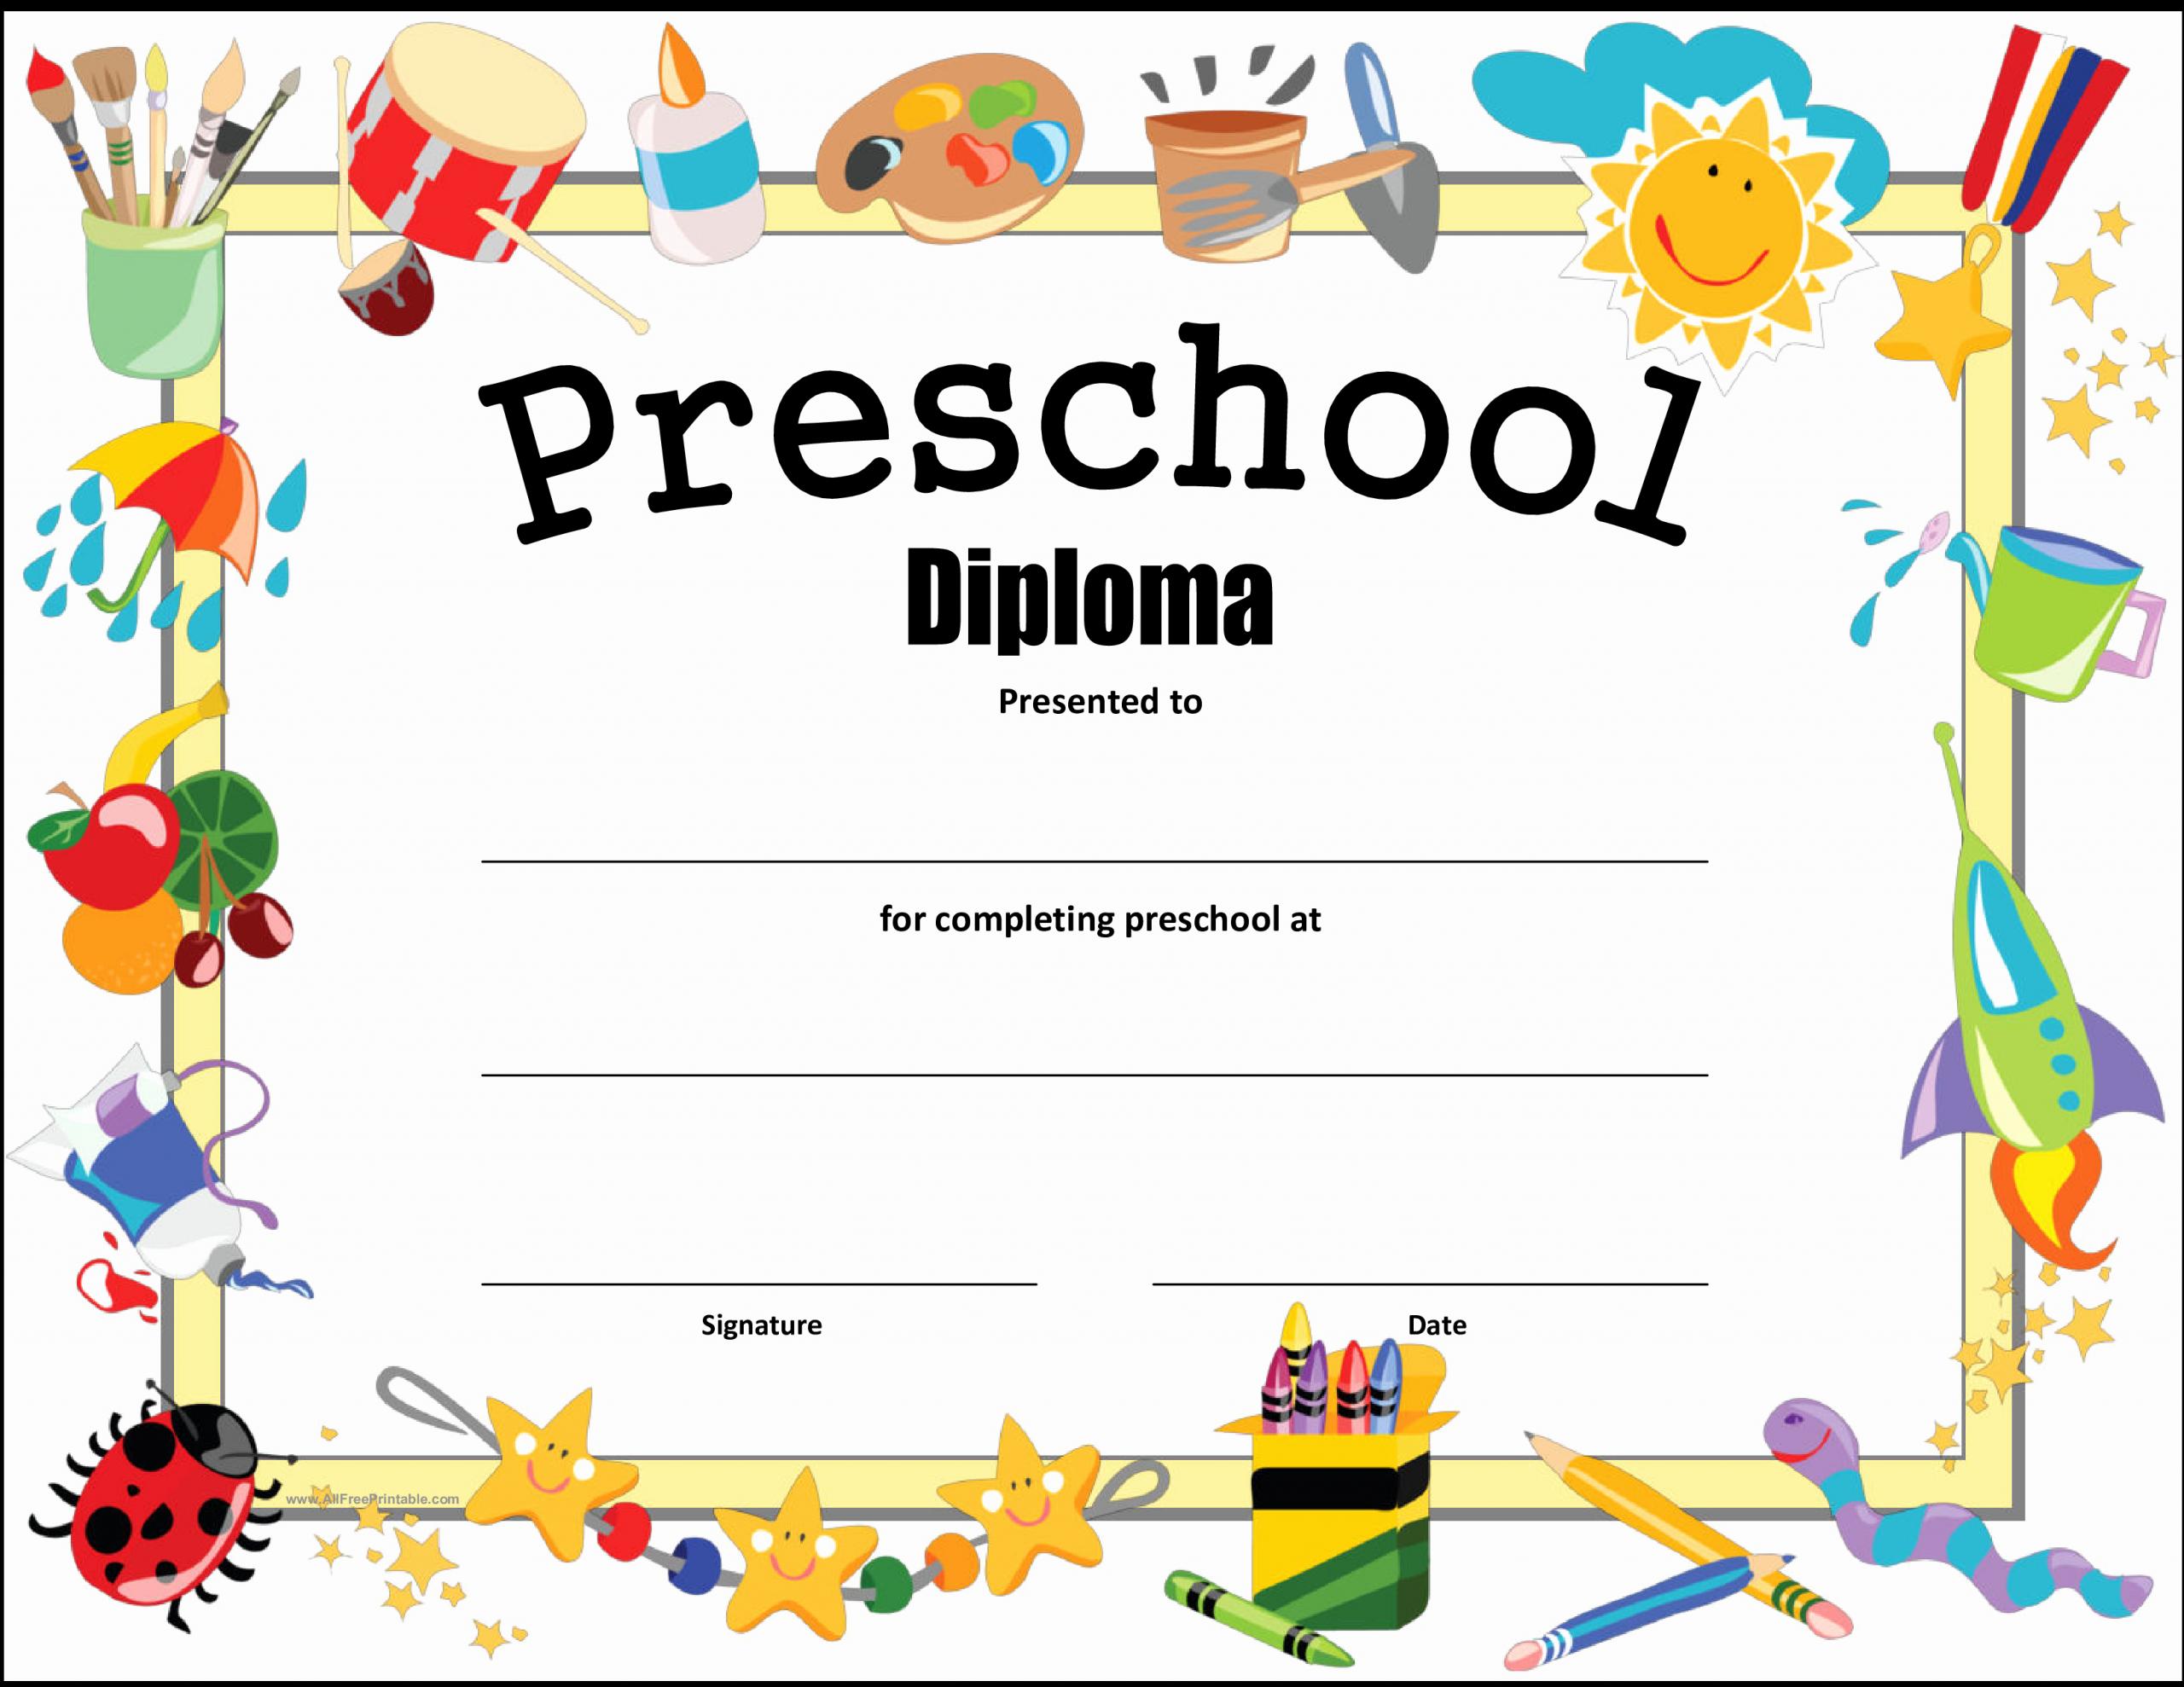 Preschool Diploma Template Free Fresh Free Preschool Diploma Certificate